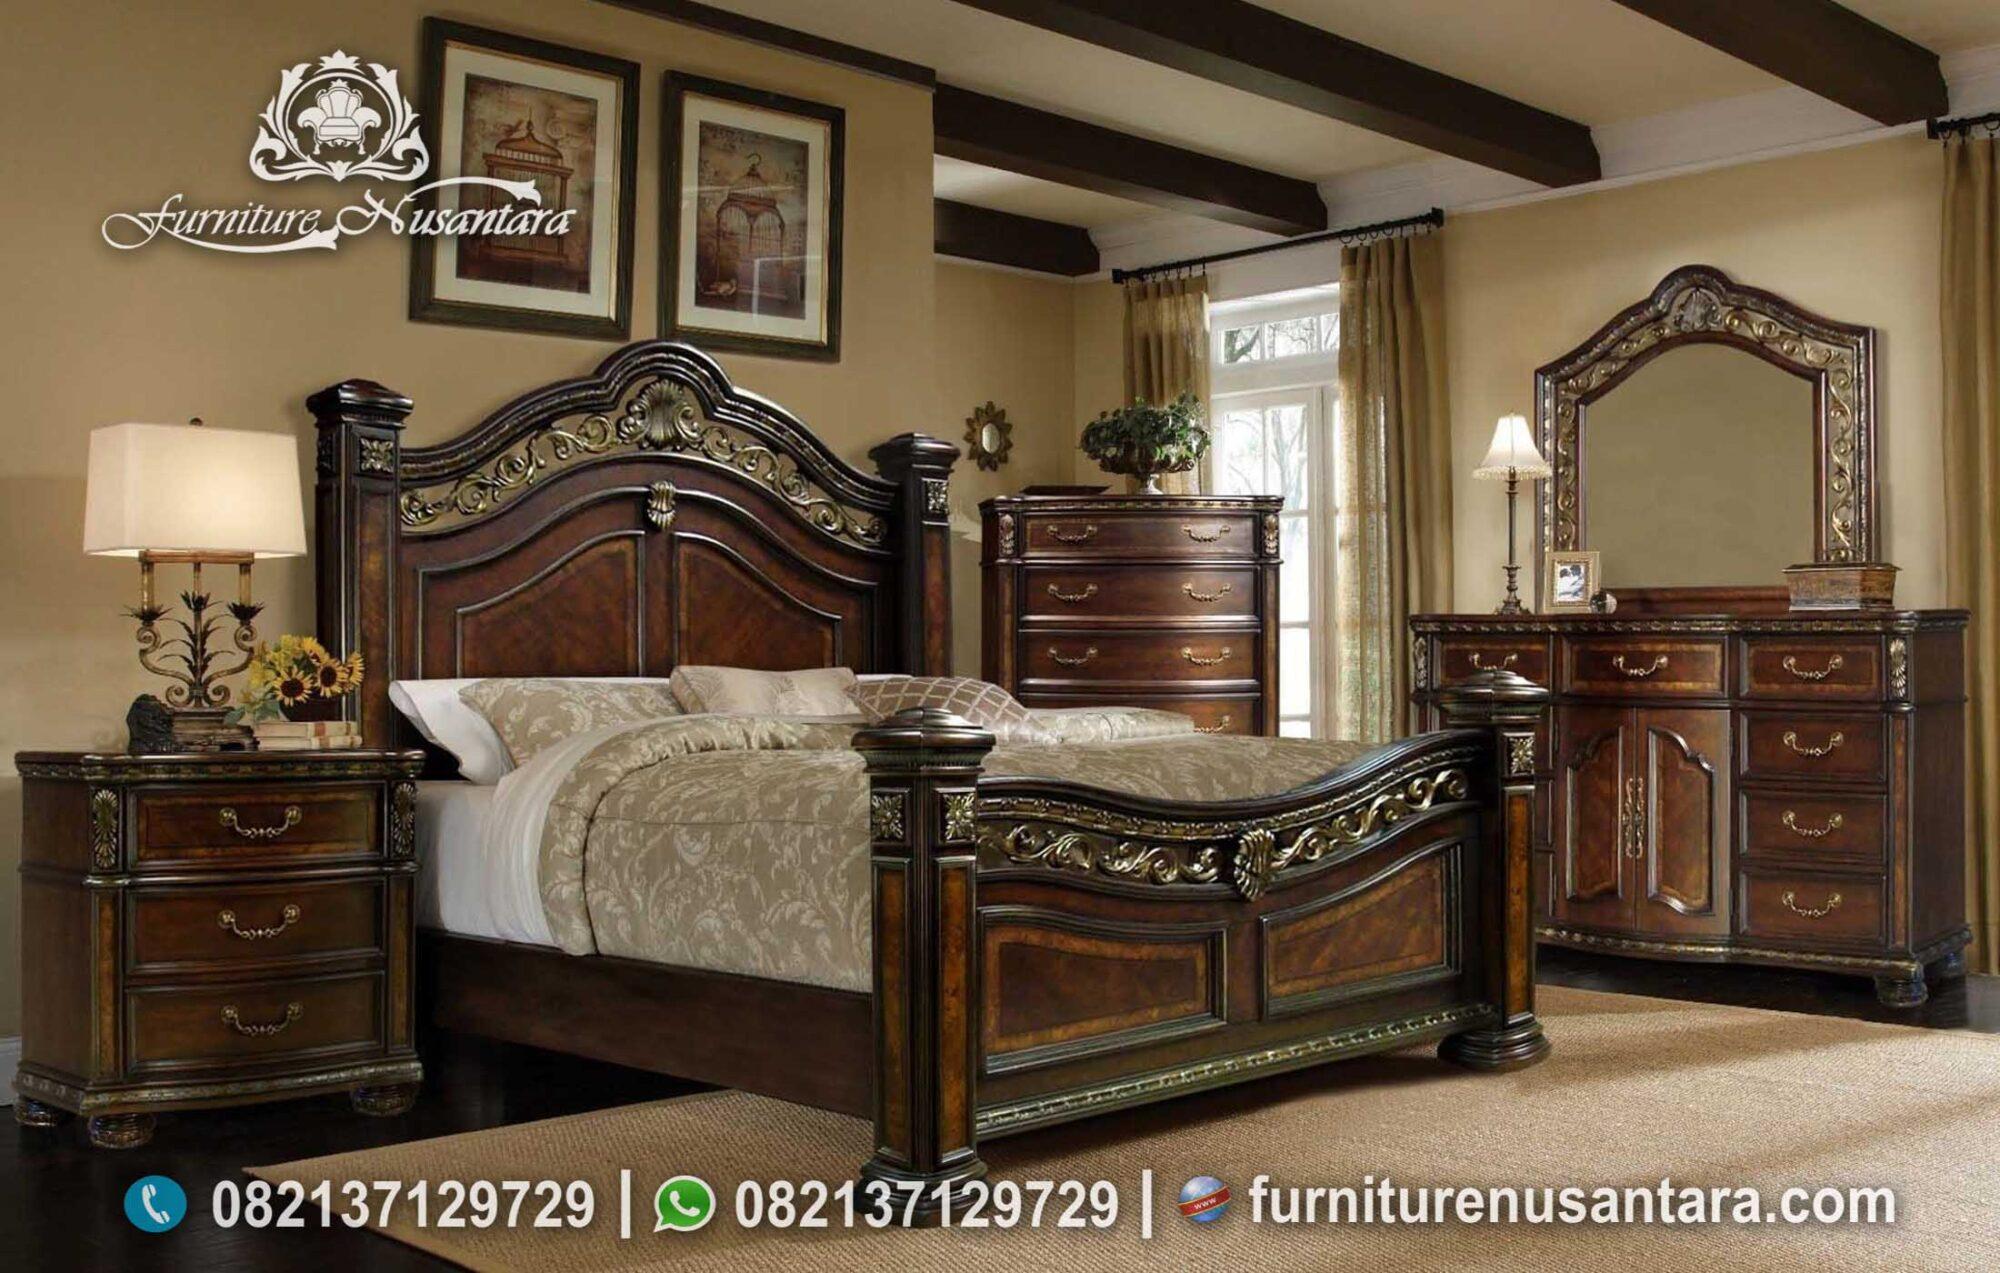 Jual Kamar Antik Kayu Jati KS-155, Furniture Nusantara